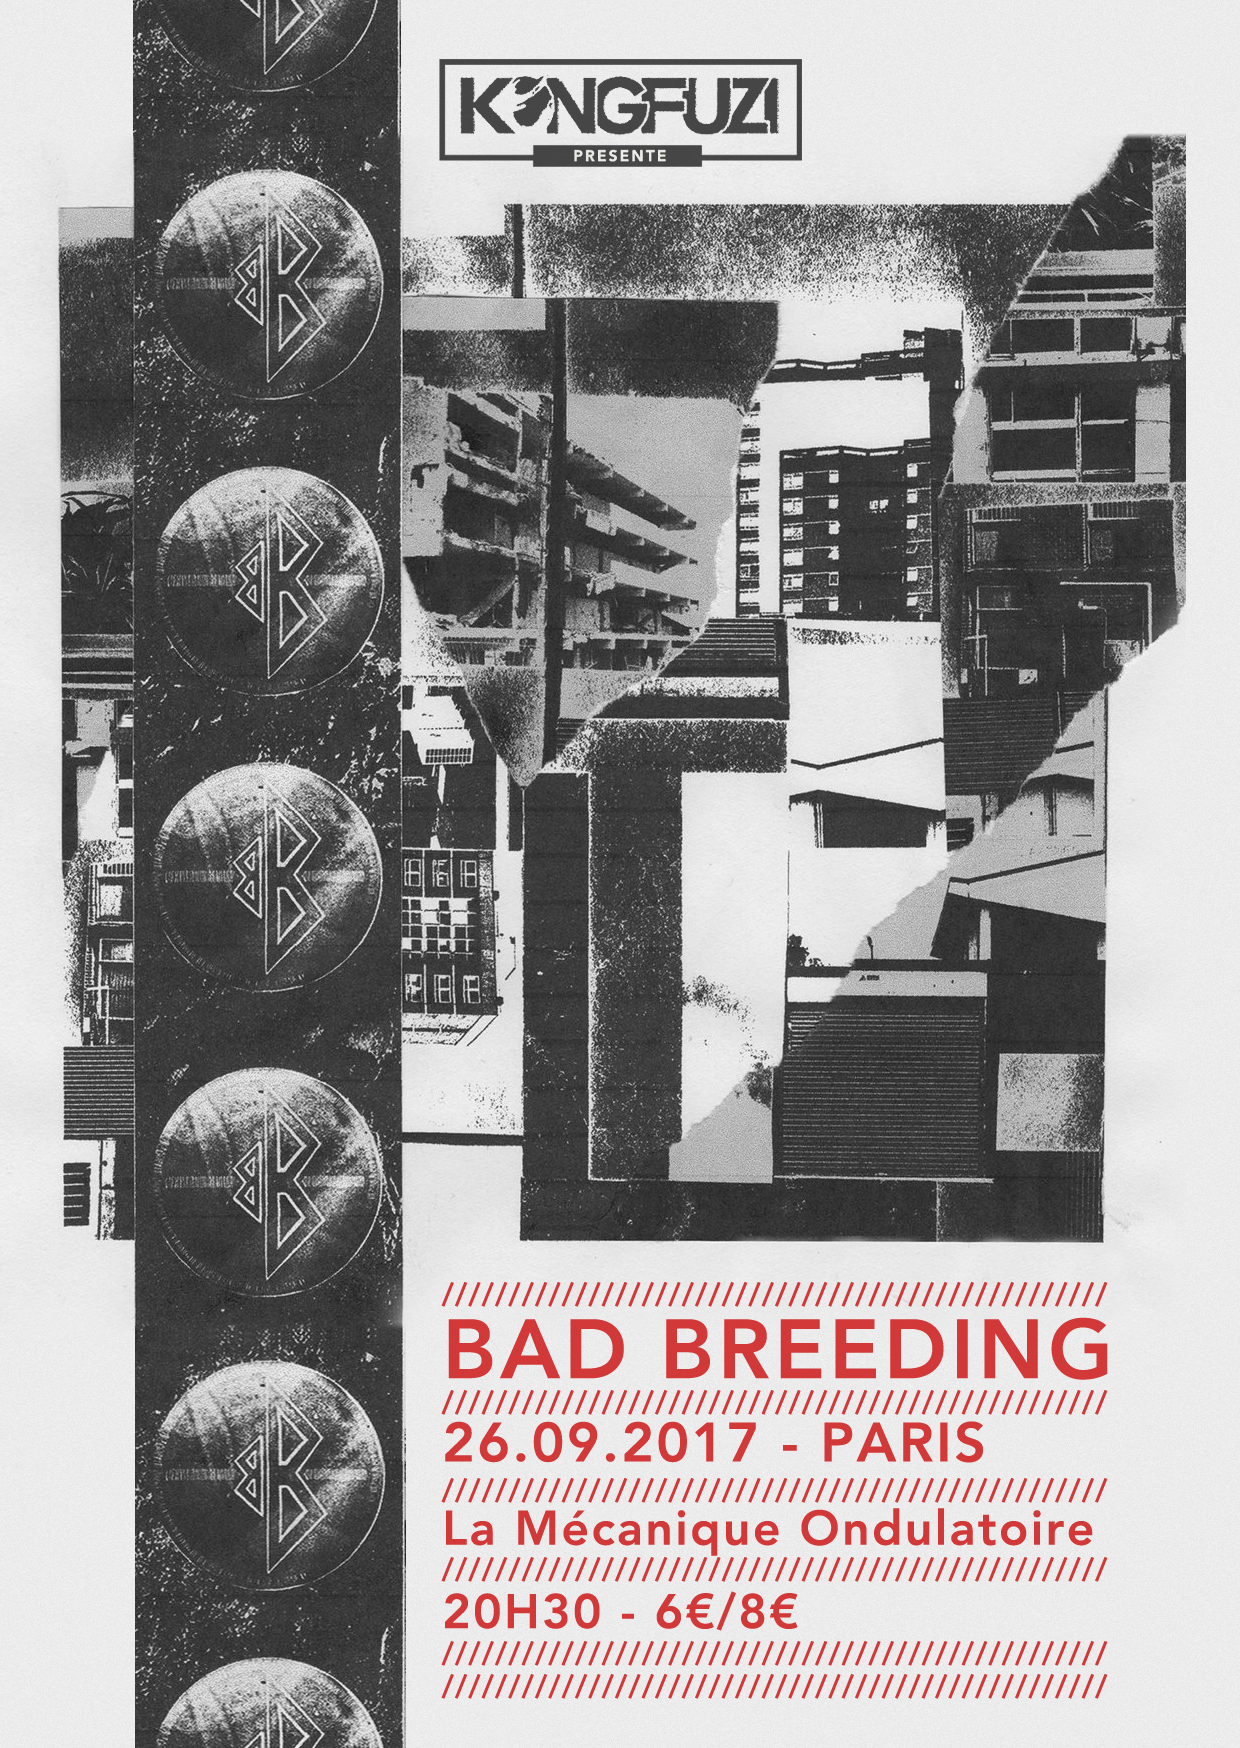 BAD BREEDING // 26.09